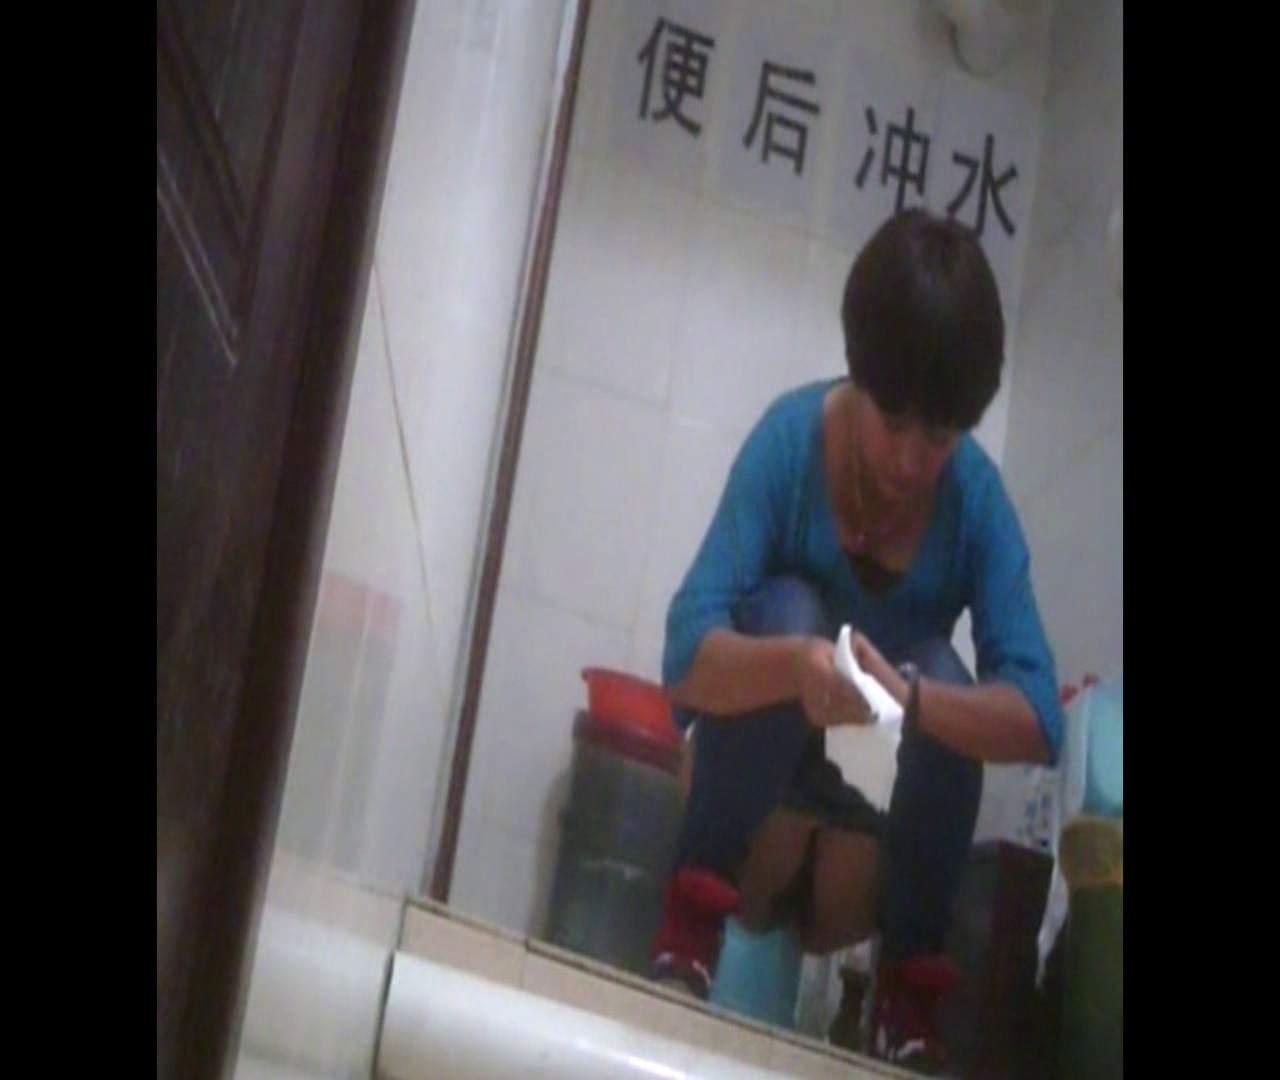 Vol.37 豊満な胸を持つマッシュルームカットな彼女 洗面所 | 丸見え  63画像 16